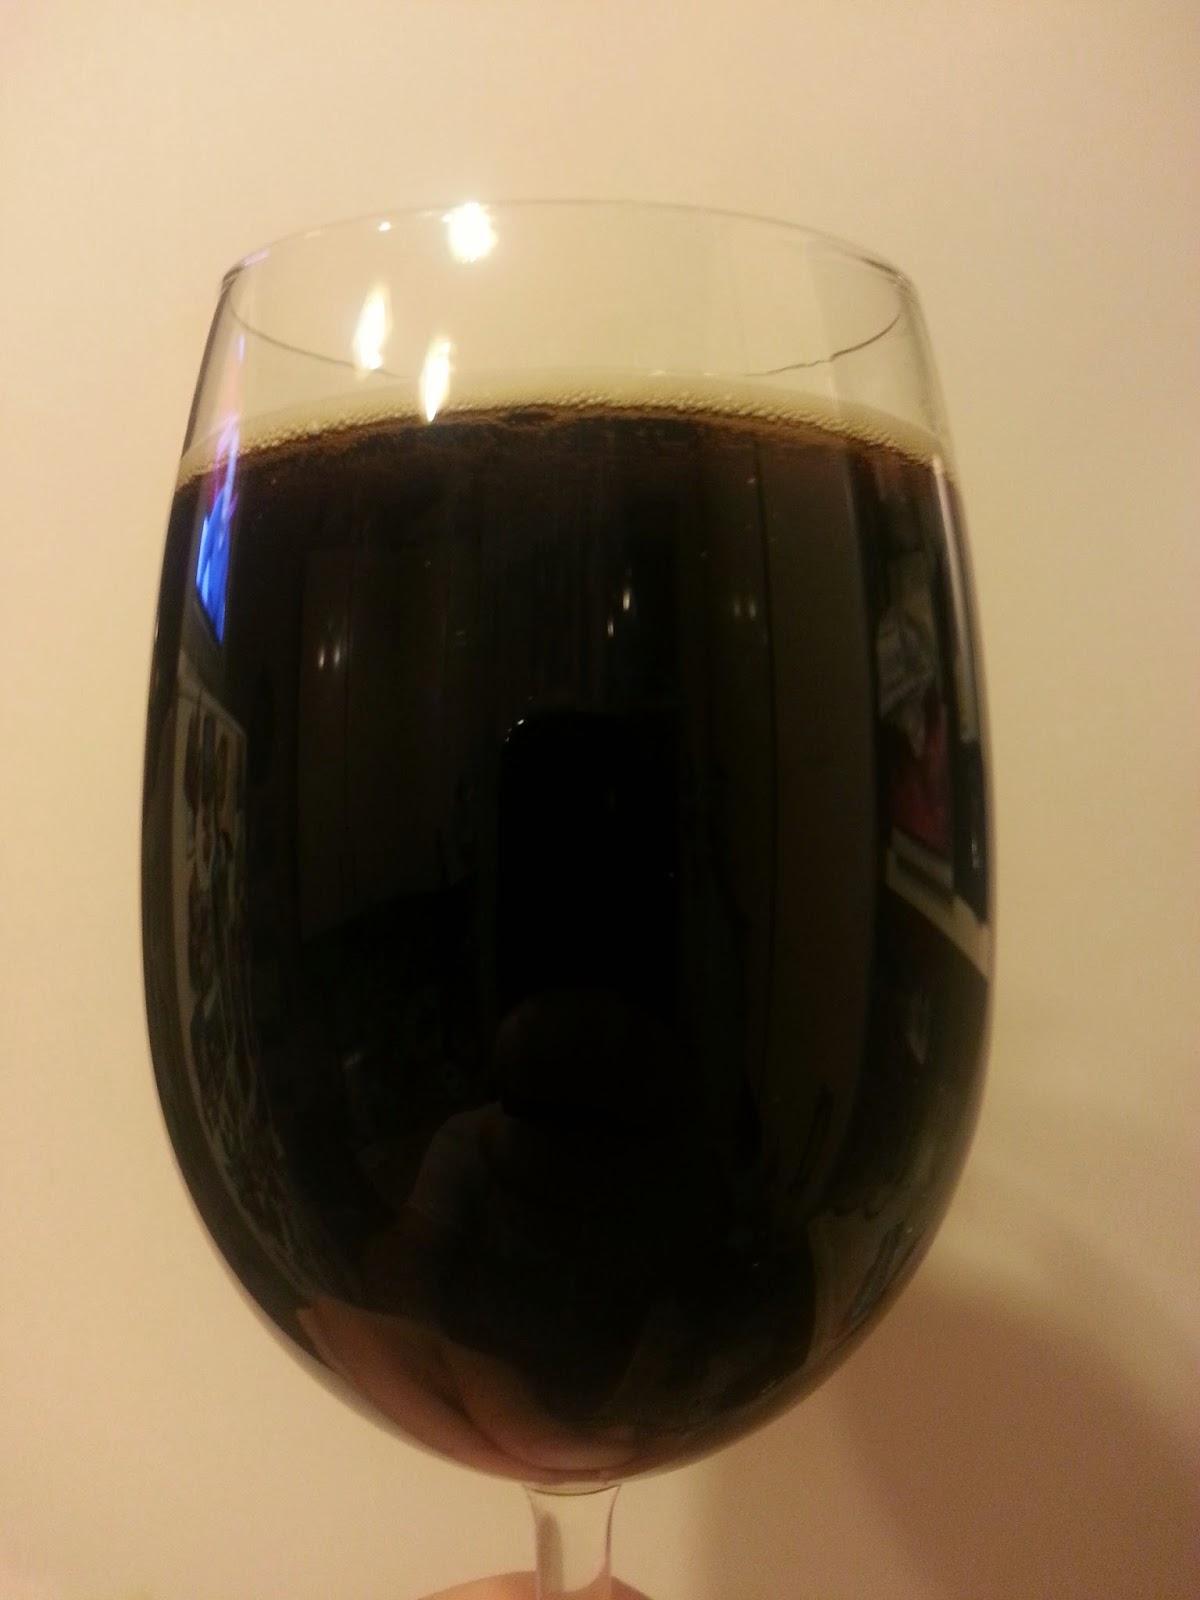 St. Peter's Winter Ale. В бокале